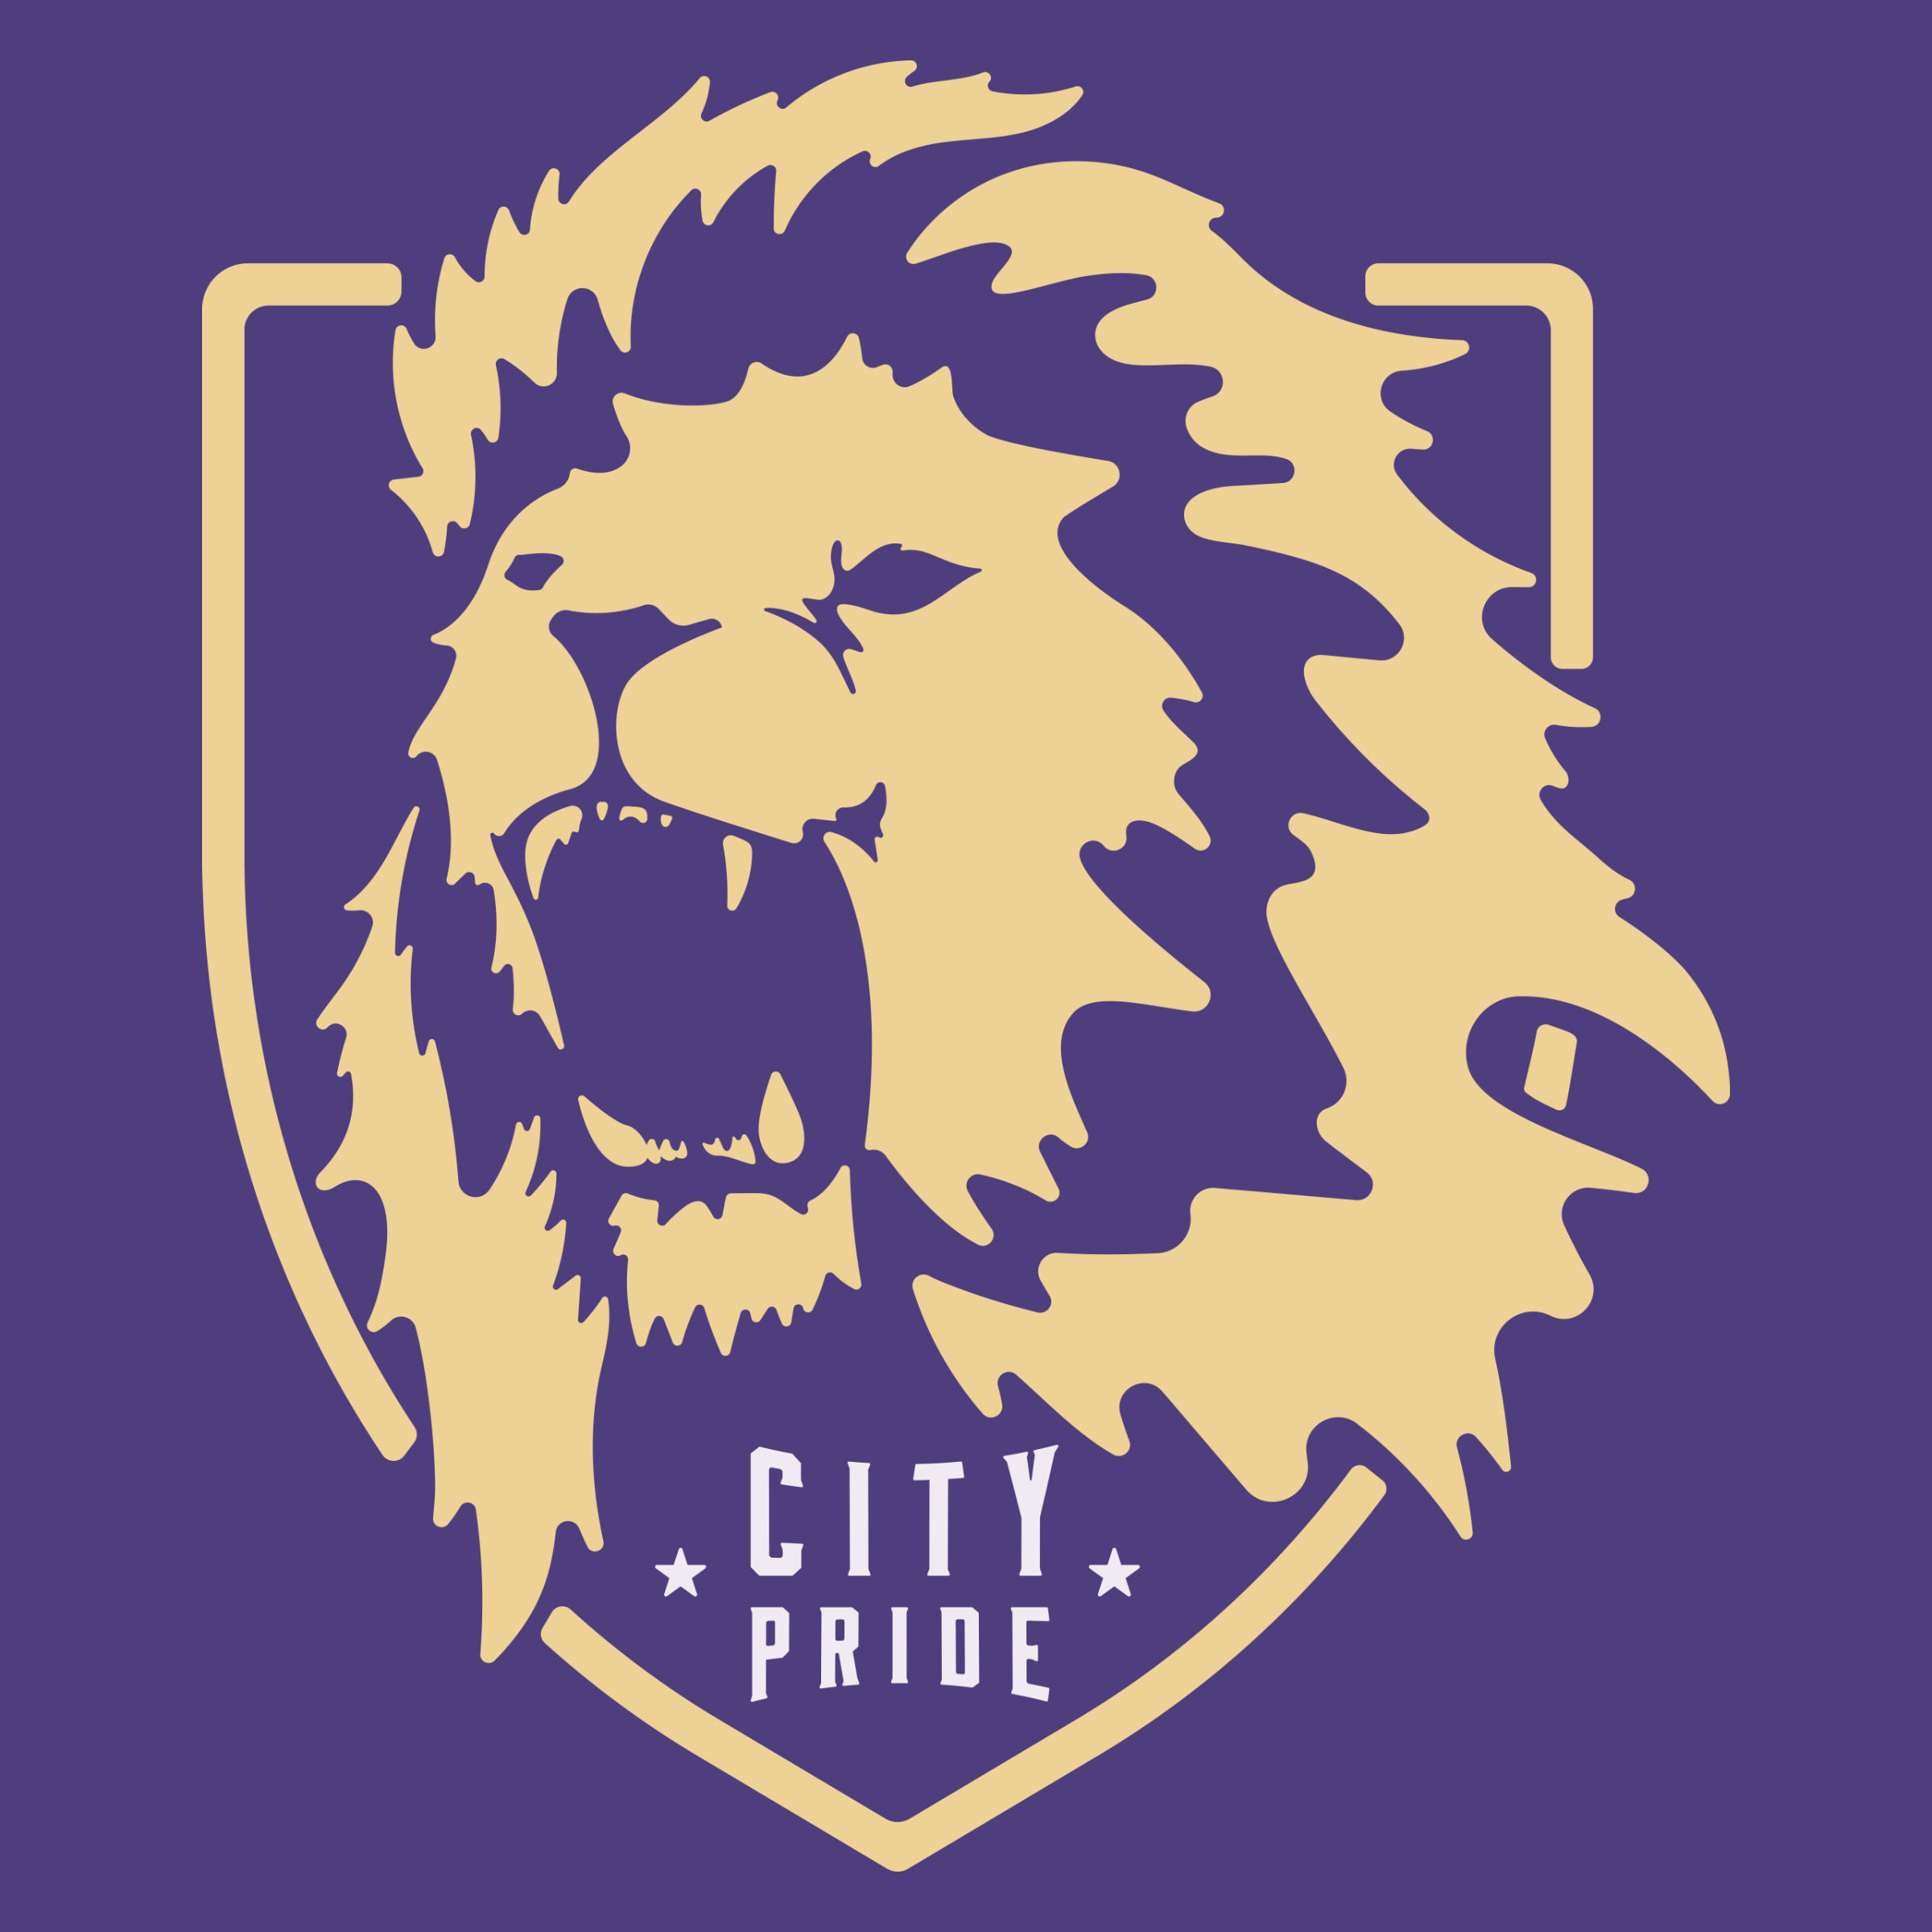 City Pride Detail